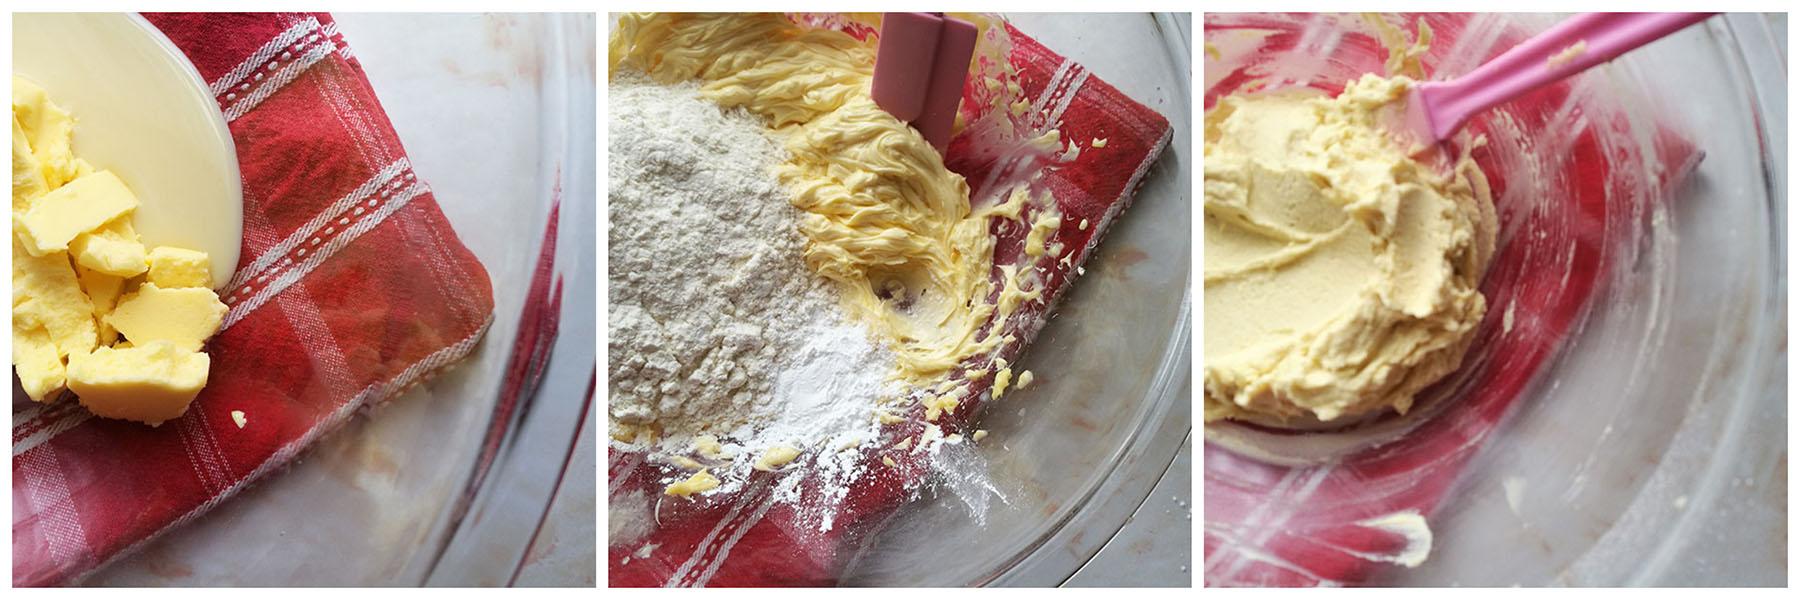 Condensed Milk Shortbread Cookies